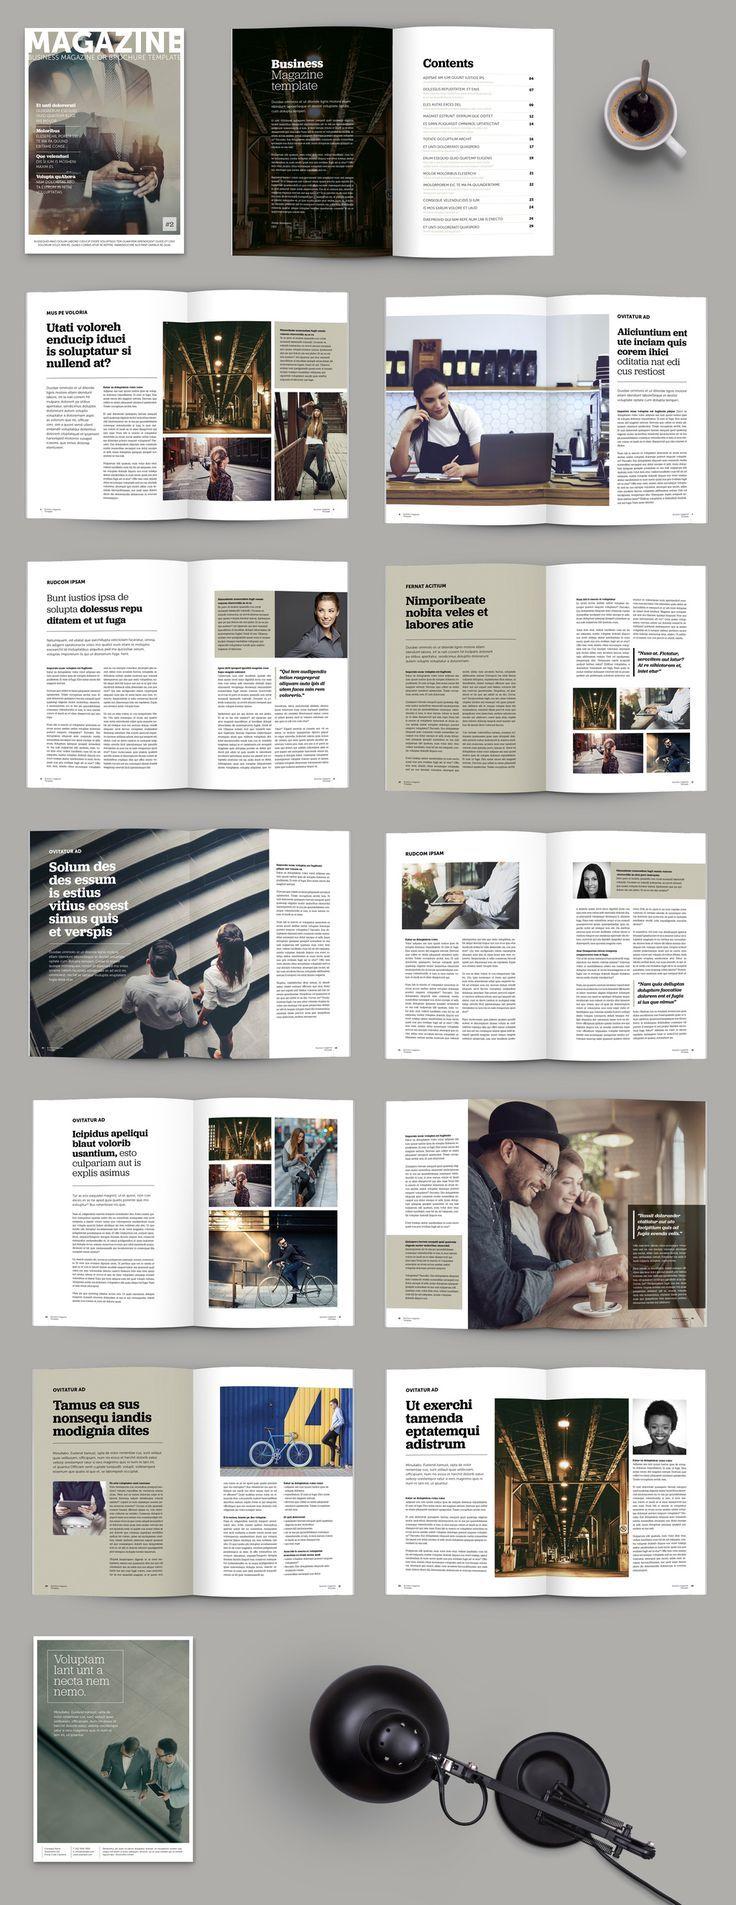 Free Magazine Layout Templates For Word Indesign Book Portfolio